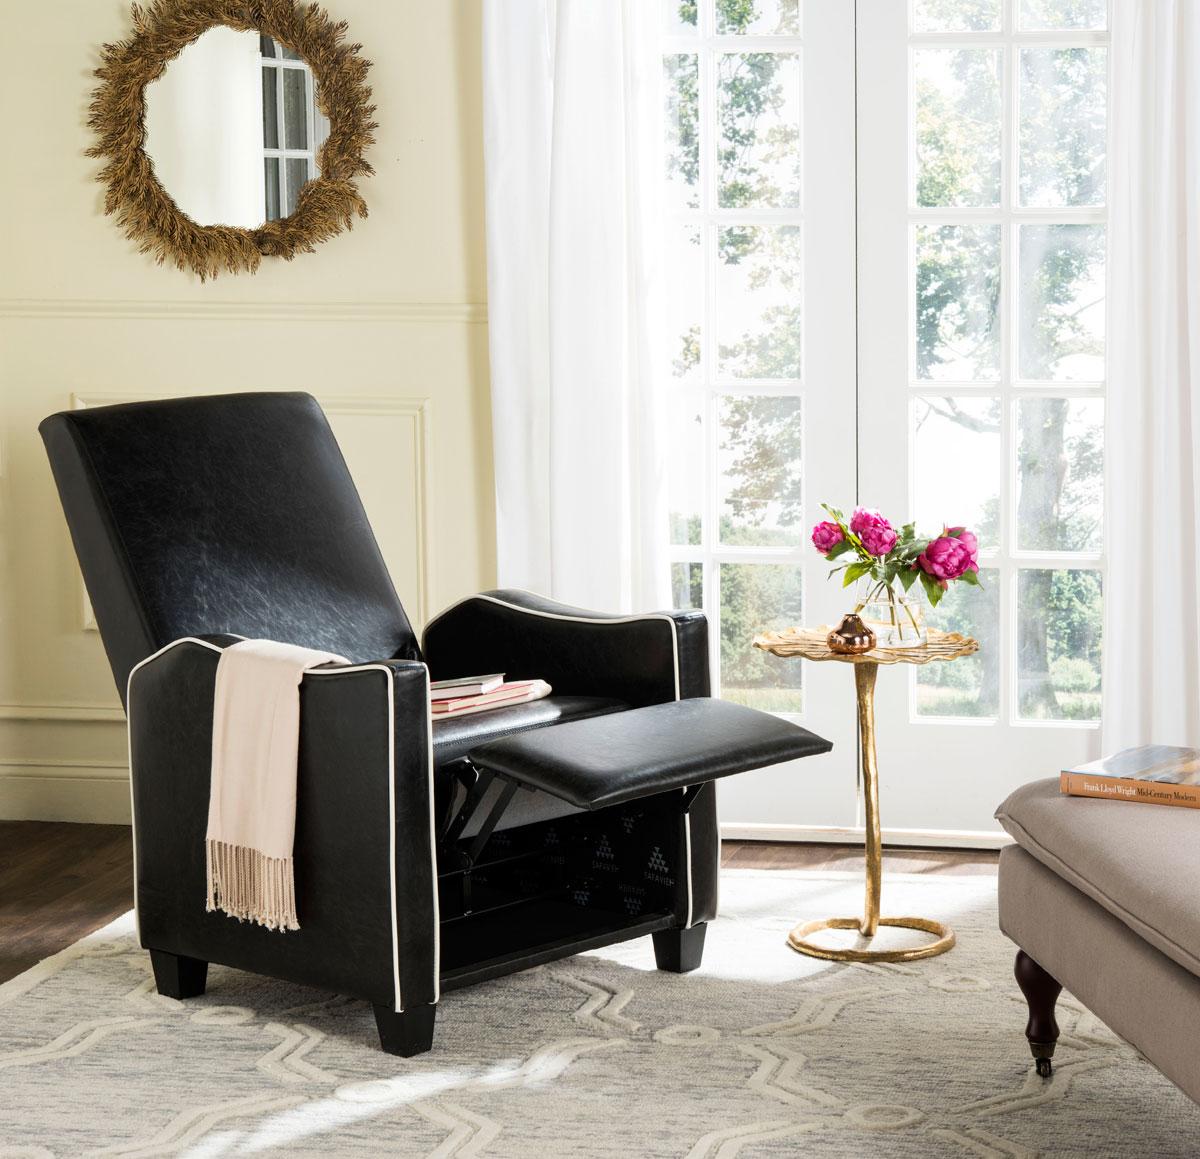 FOX6208C Recliners - Furniture by Safavieh